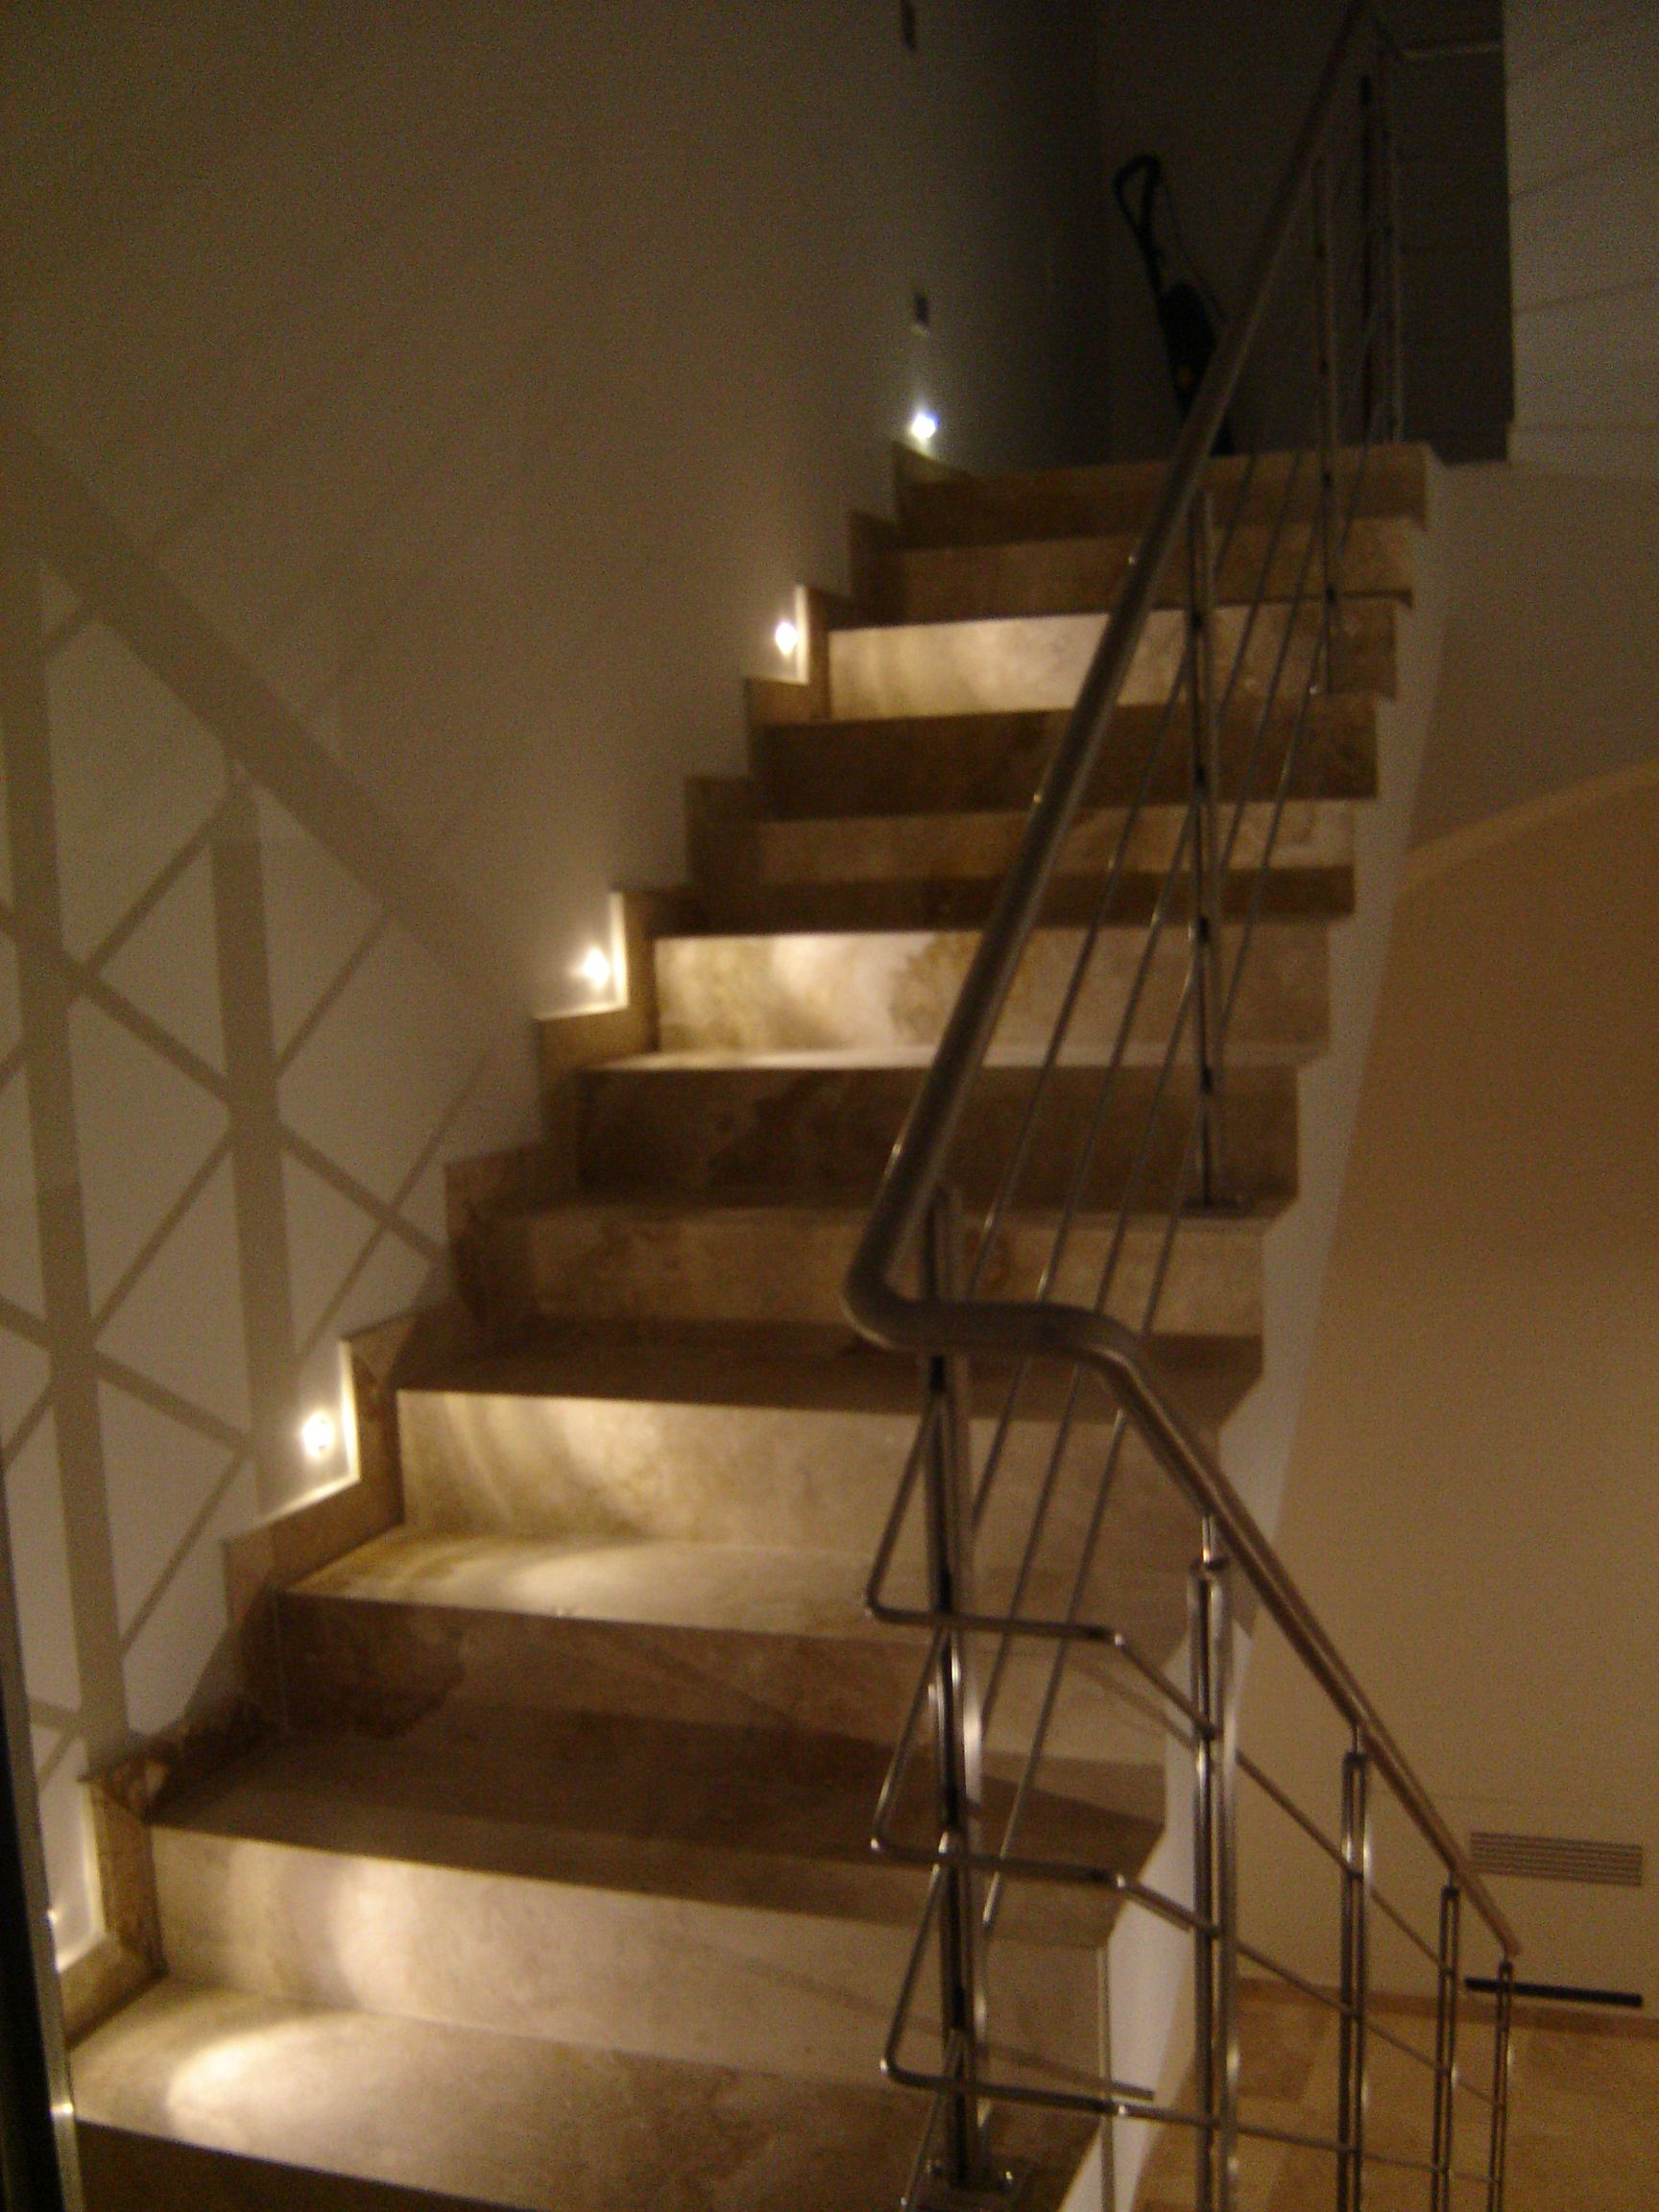 Illuminazione led scala la cava senese pinterest - Illuminazione scale a led ...